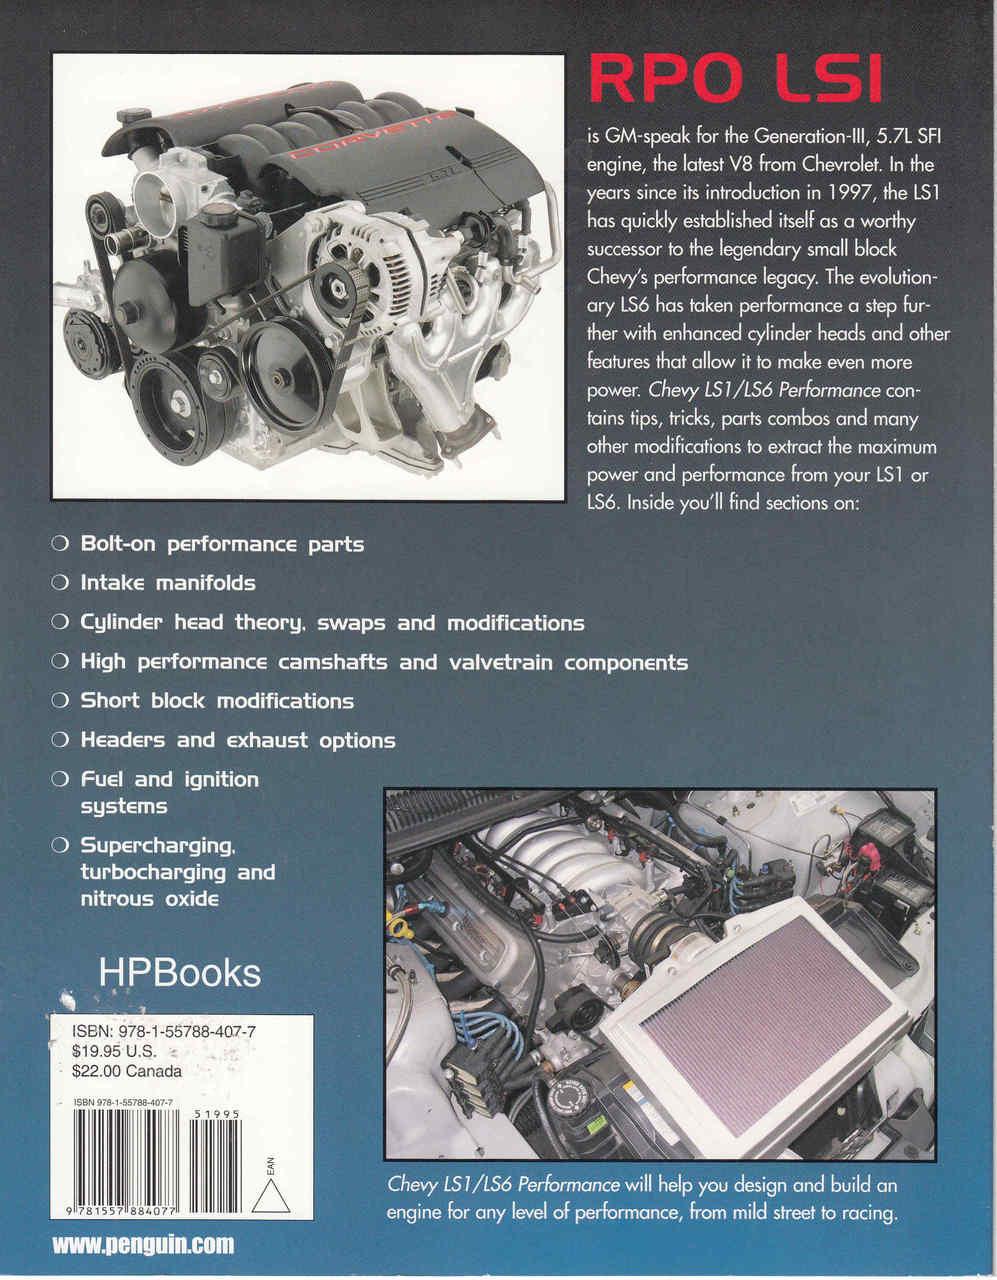 Chevy LS1/LS6 Performance HP Books